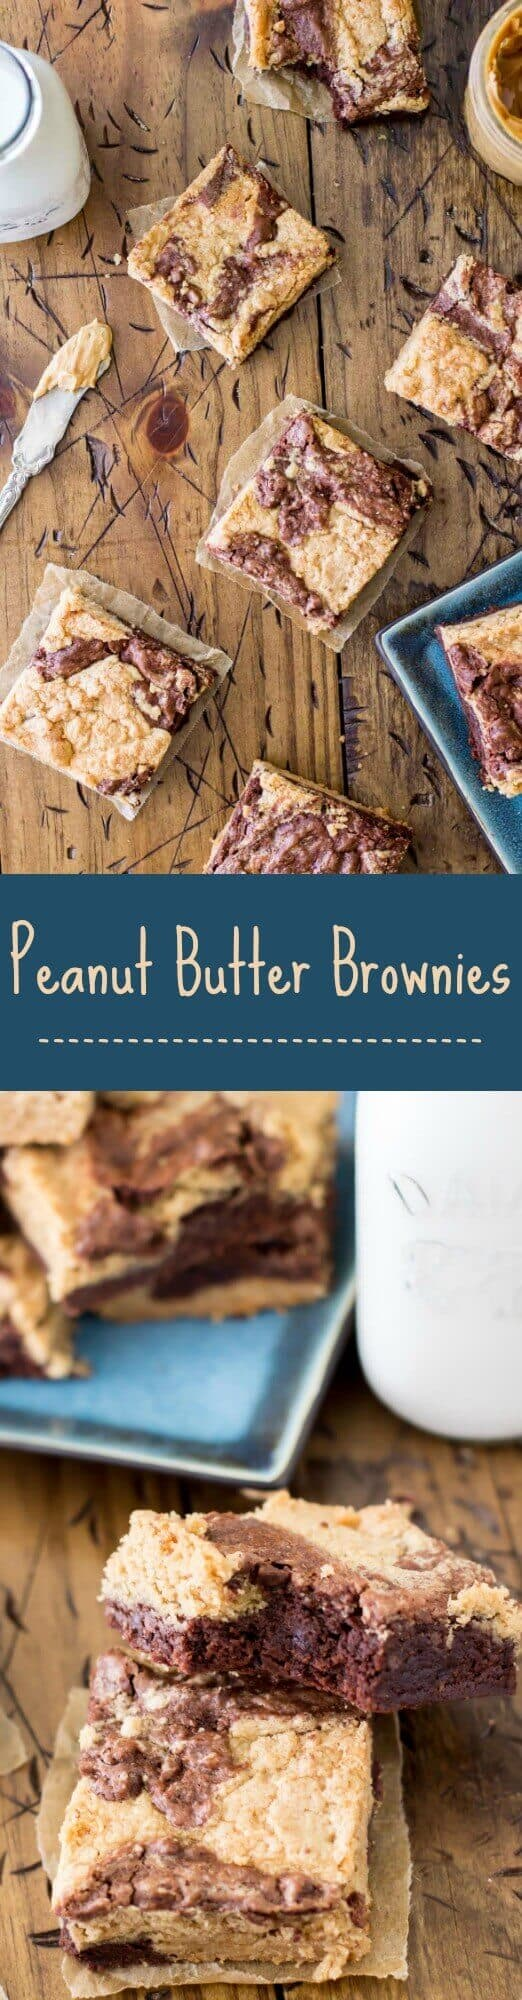 Peanut Butter Brownies -- via Sugar Spun Run